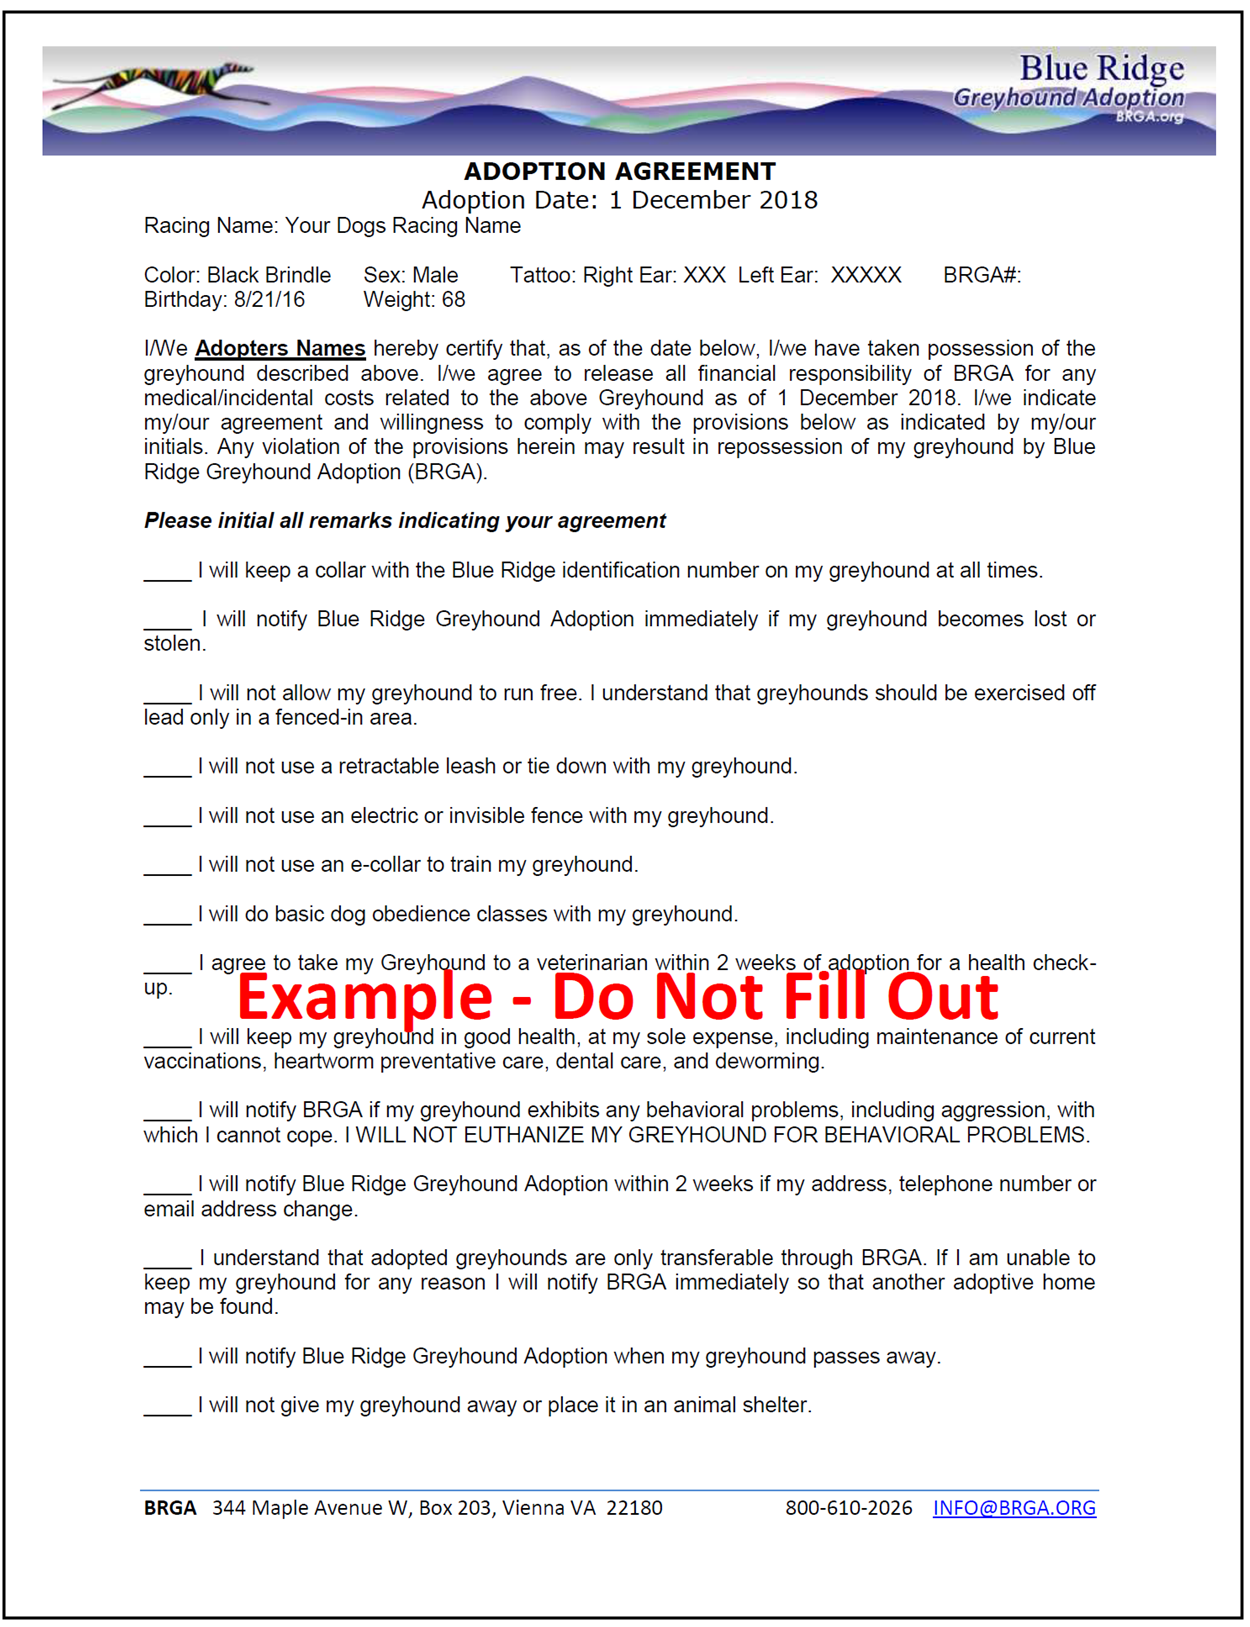 Sample Adoption Agreement